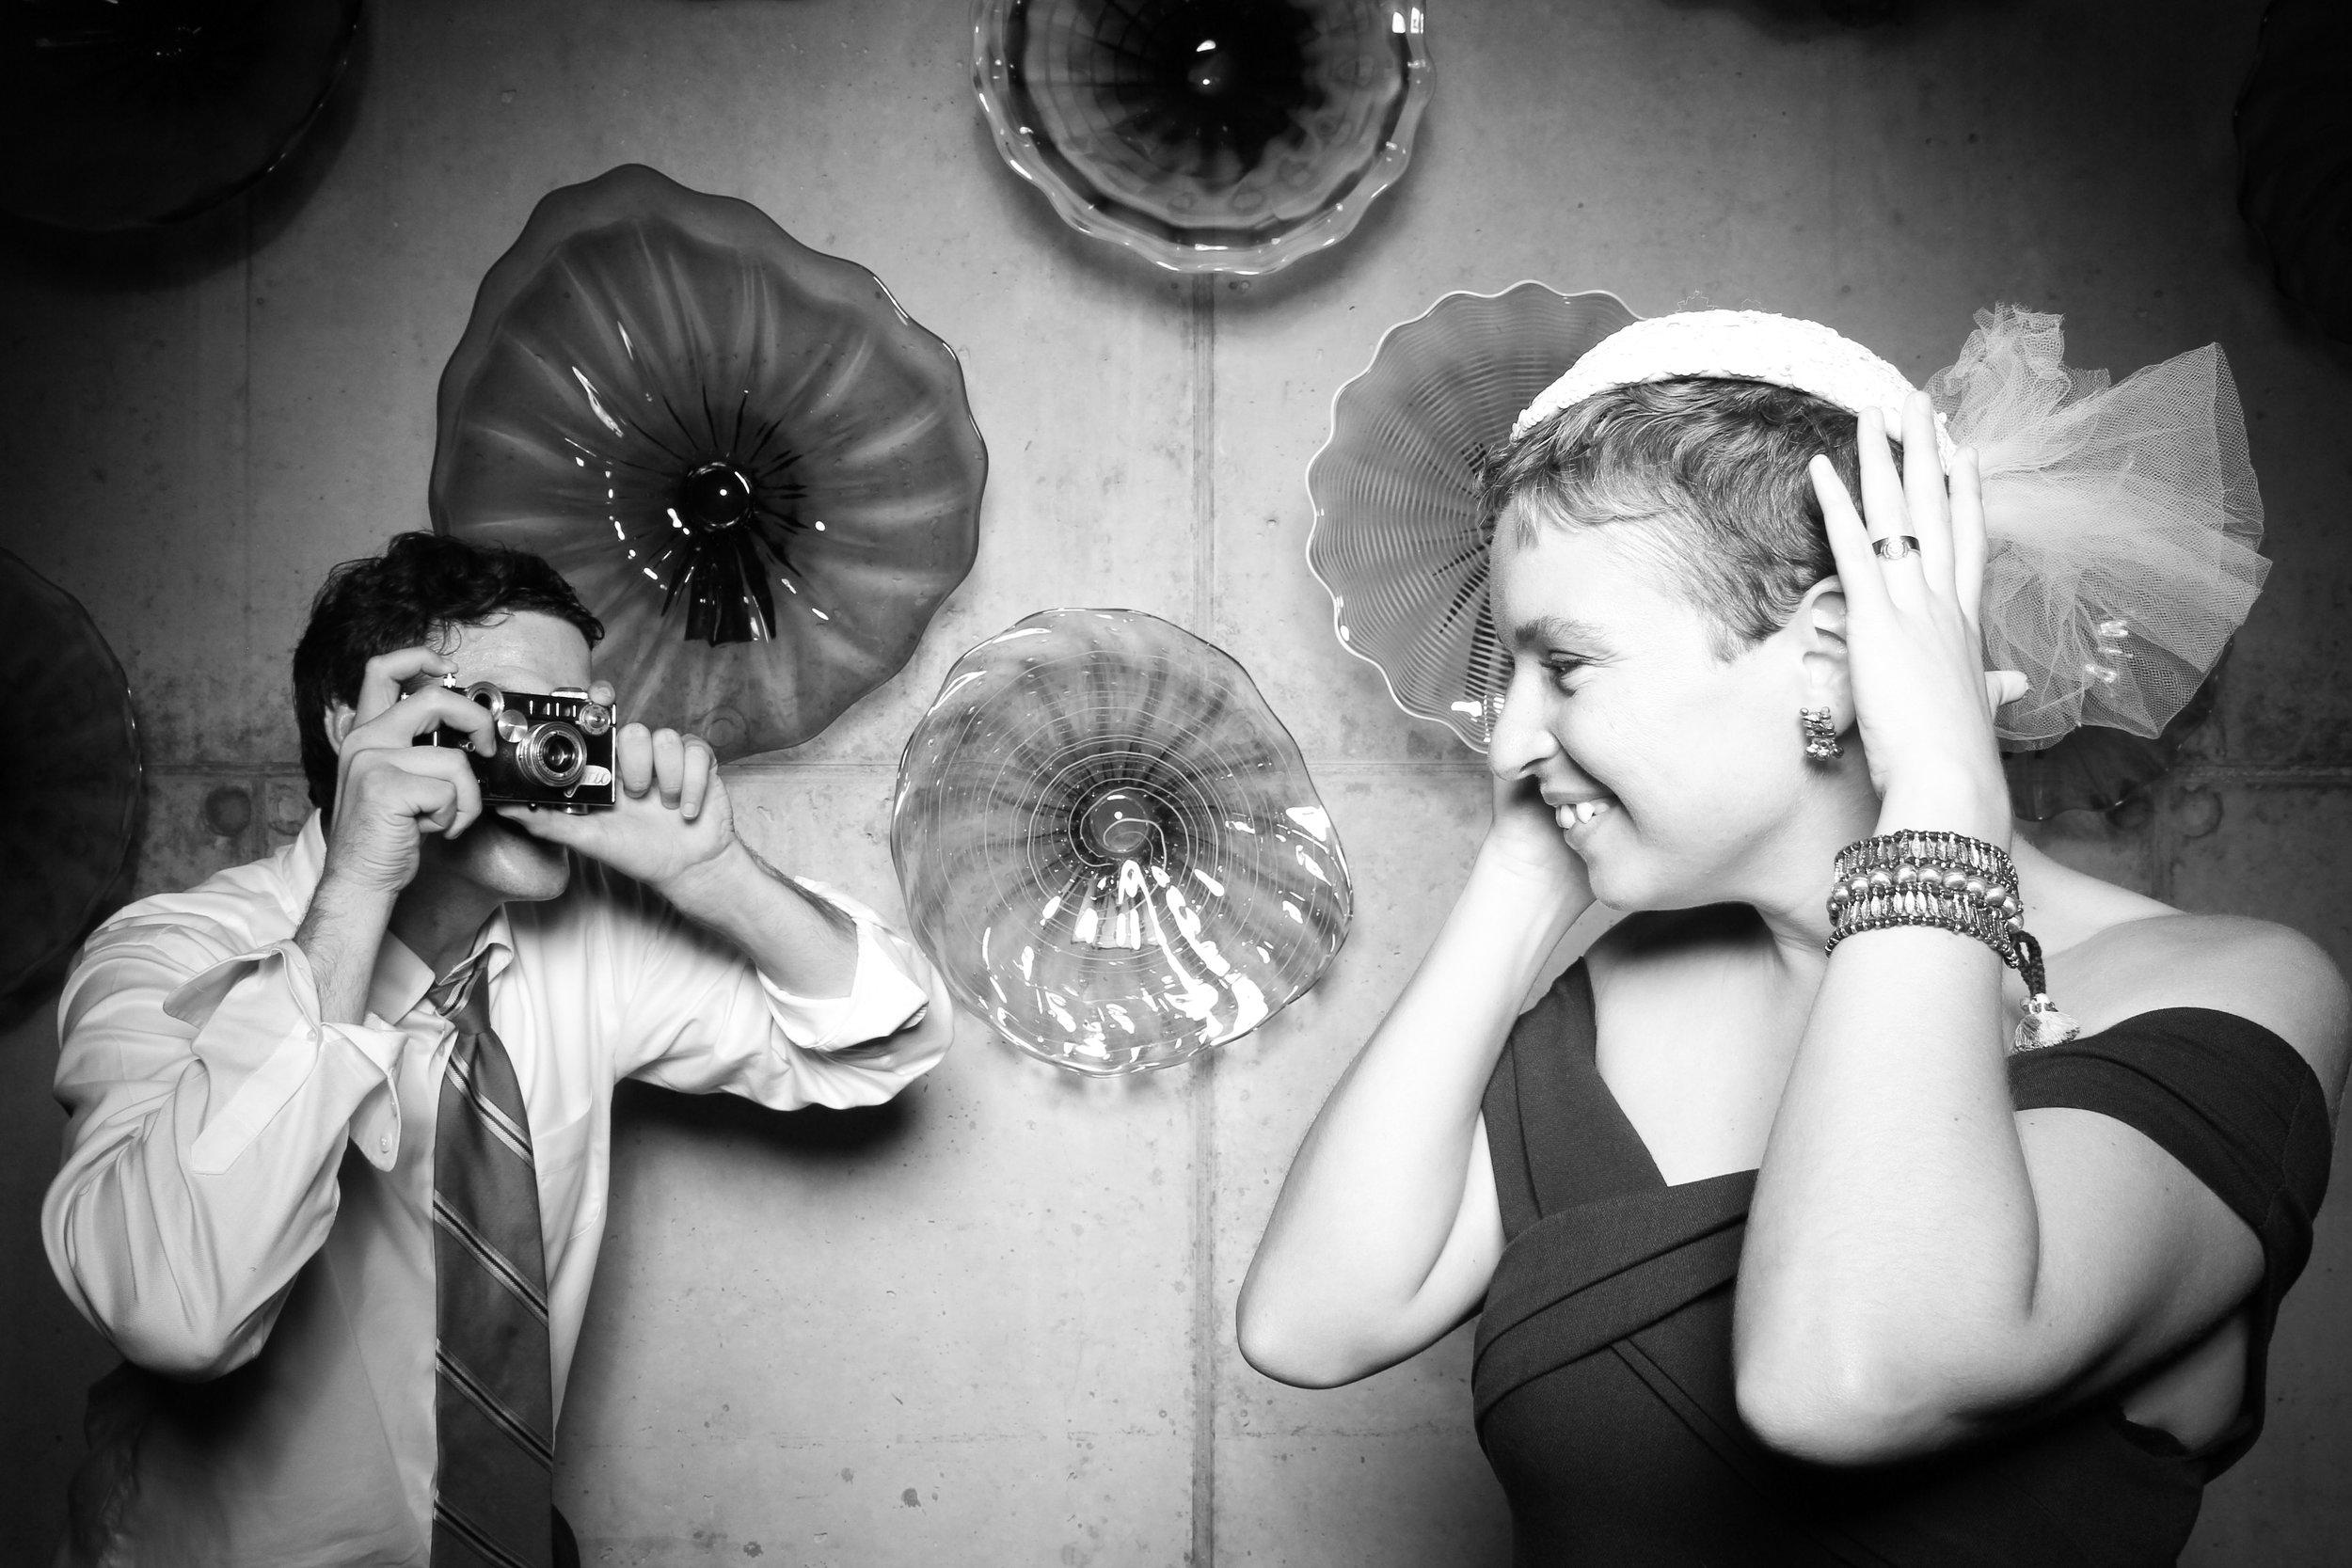 Chicago_Vintage_Wedding_Photobooth_Ignite_26.jpg